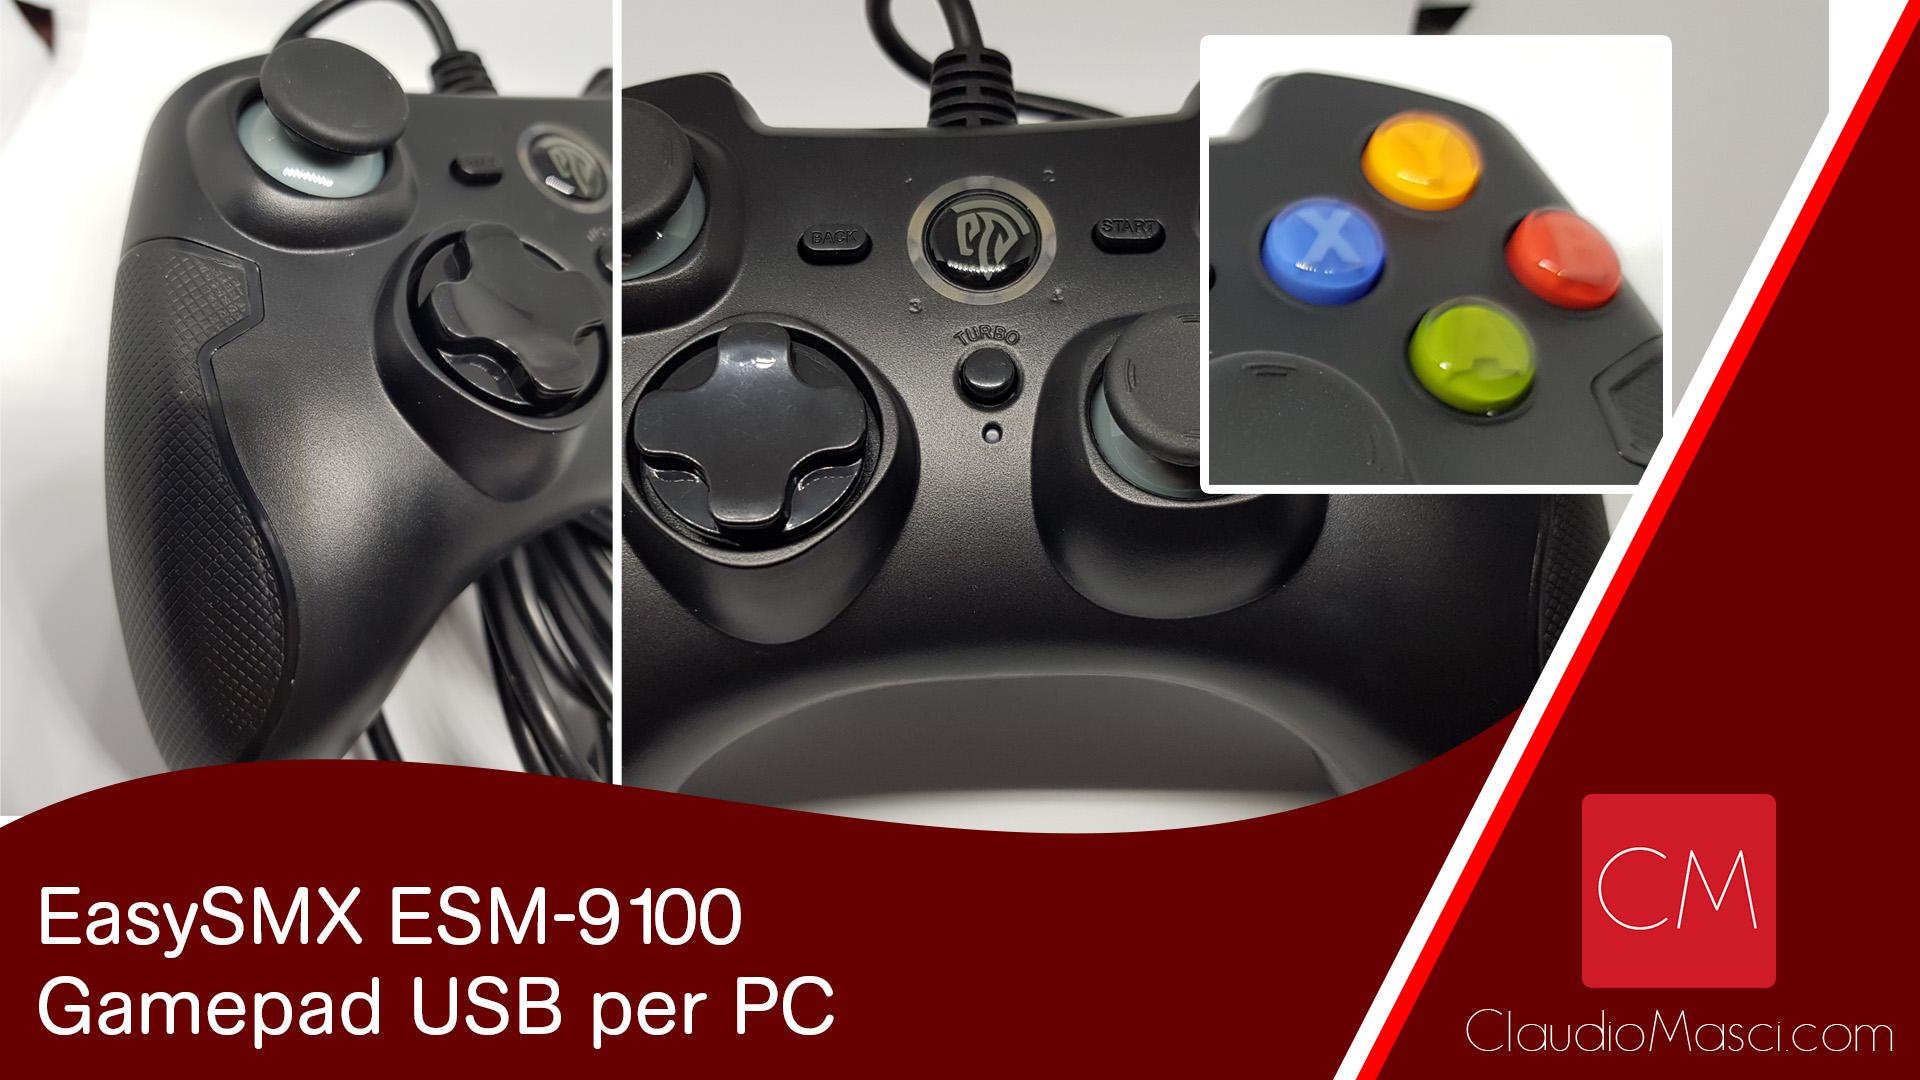 EasySMX ESM-9100 – Gamepad USB per PC